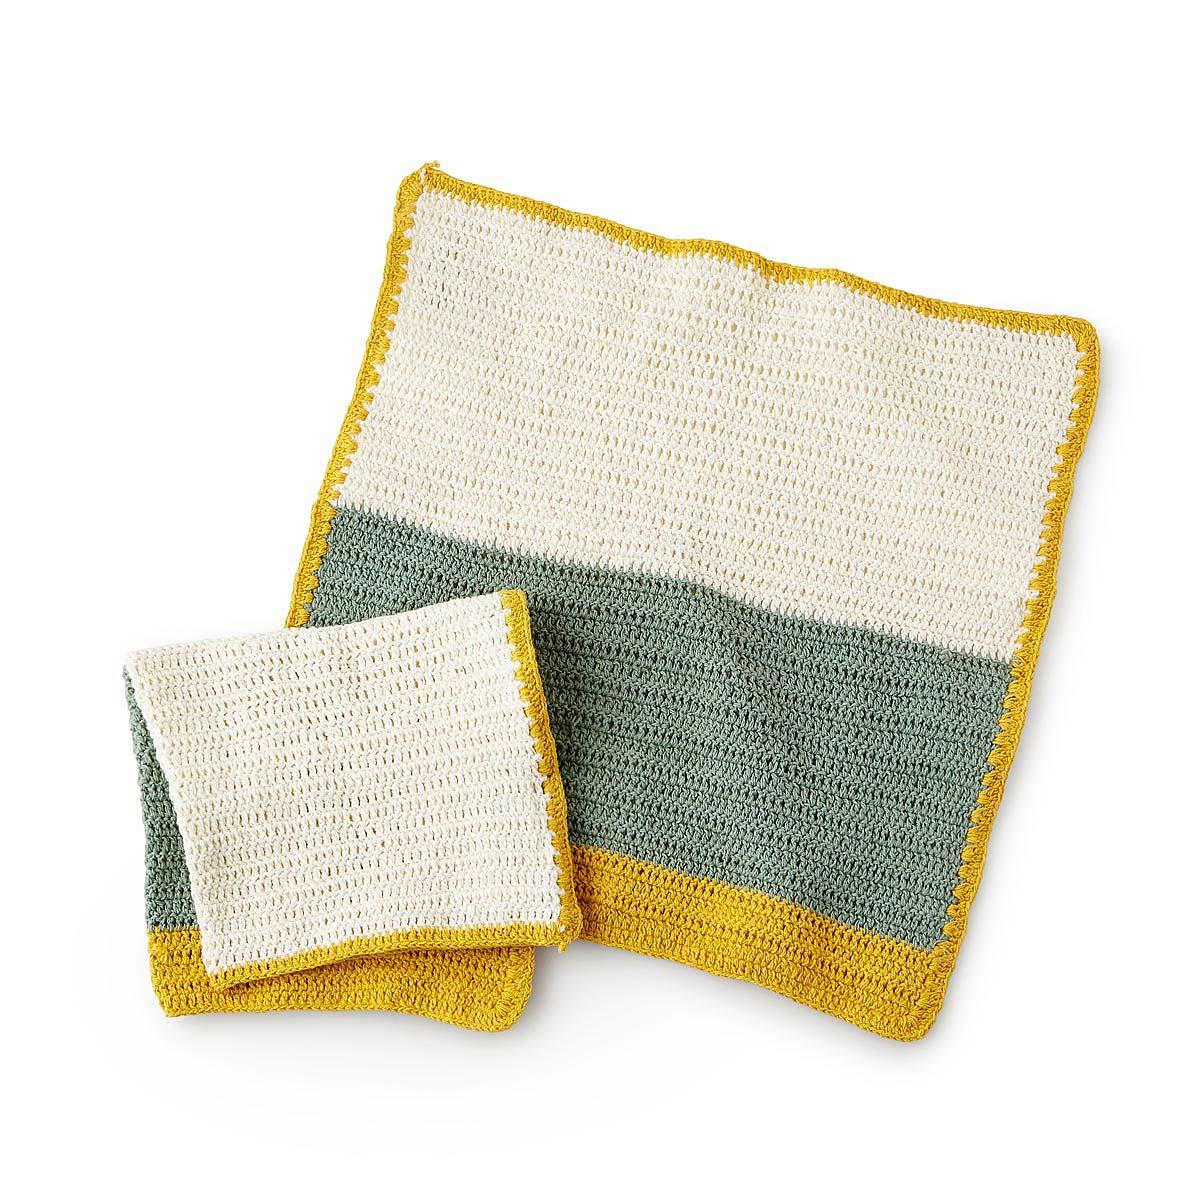 Crocheting Dish Towels : Crochet Dishcloths - Set of 2 hand crocheted, cloth dish towel ...